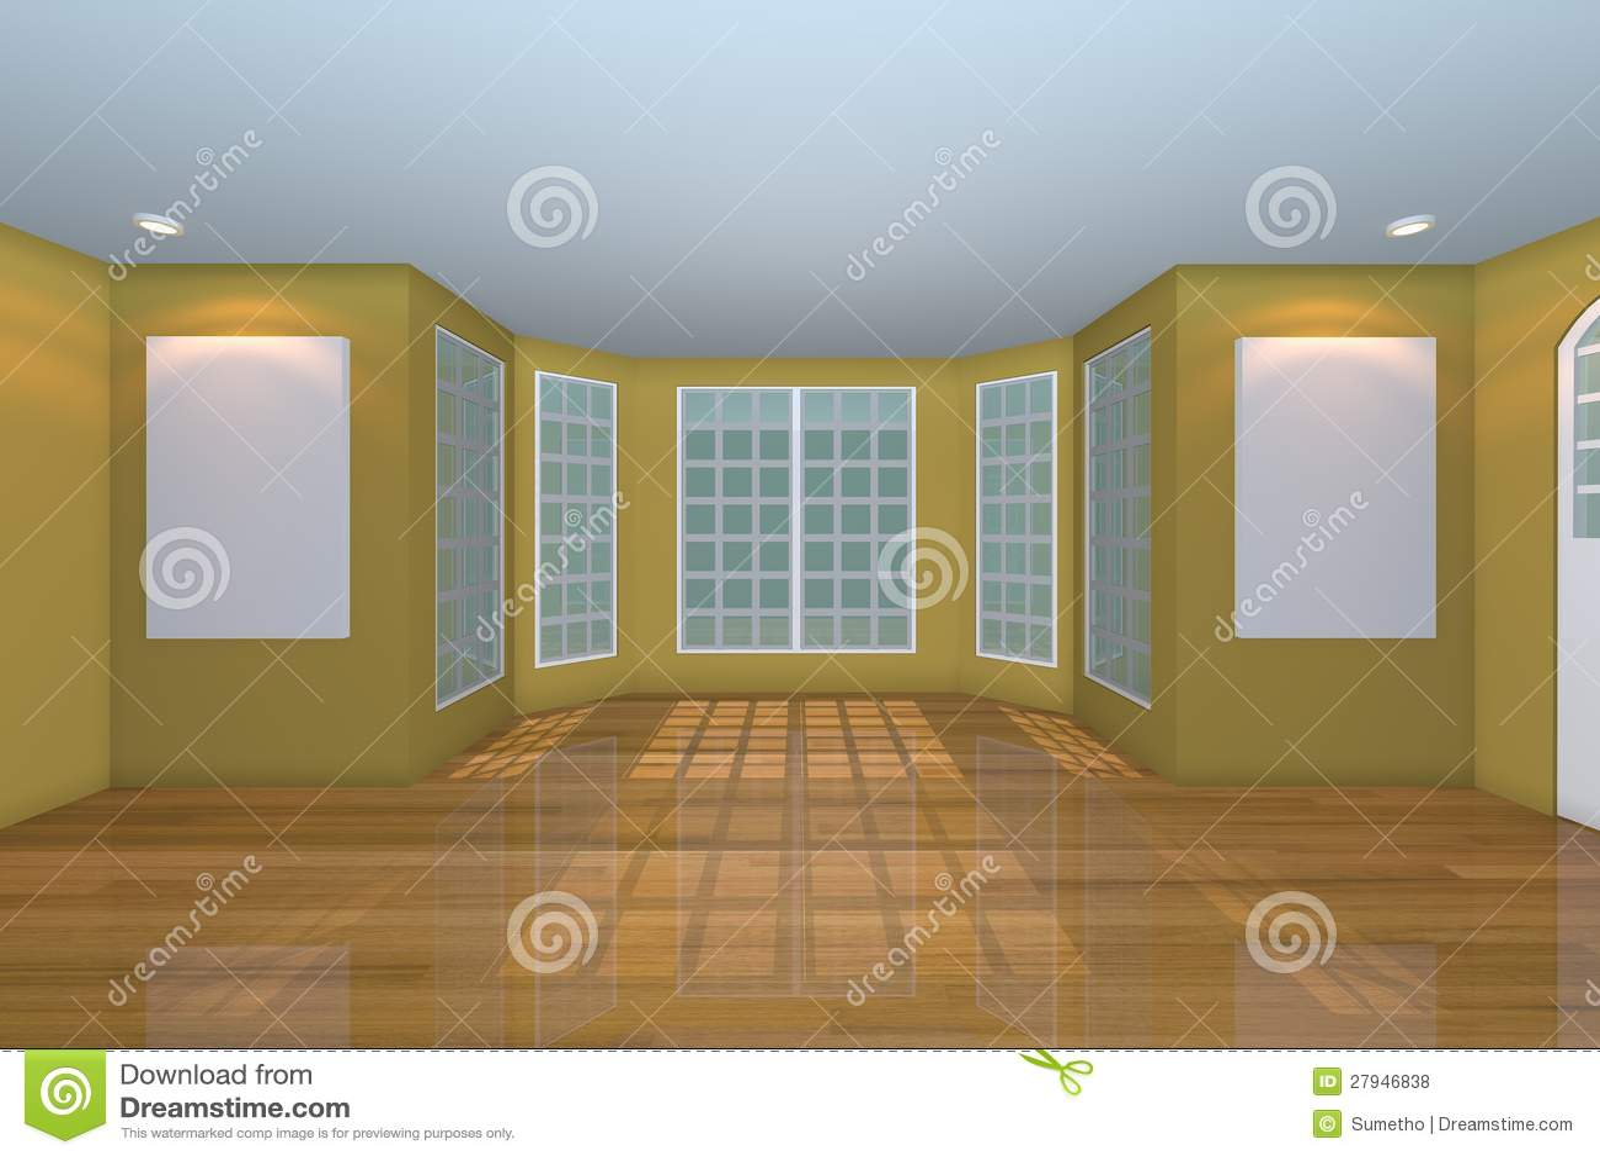 Lege gele woonkamer royalty vrije stock foto's   afbeelding: 27946838